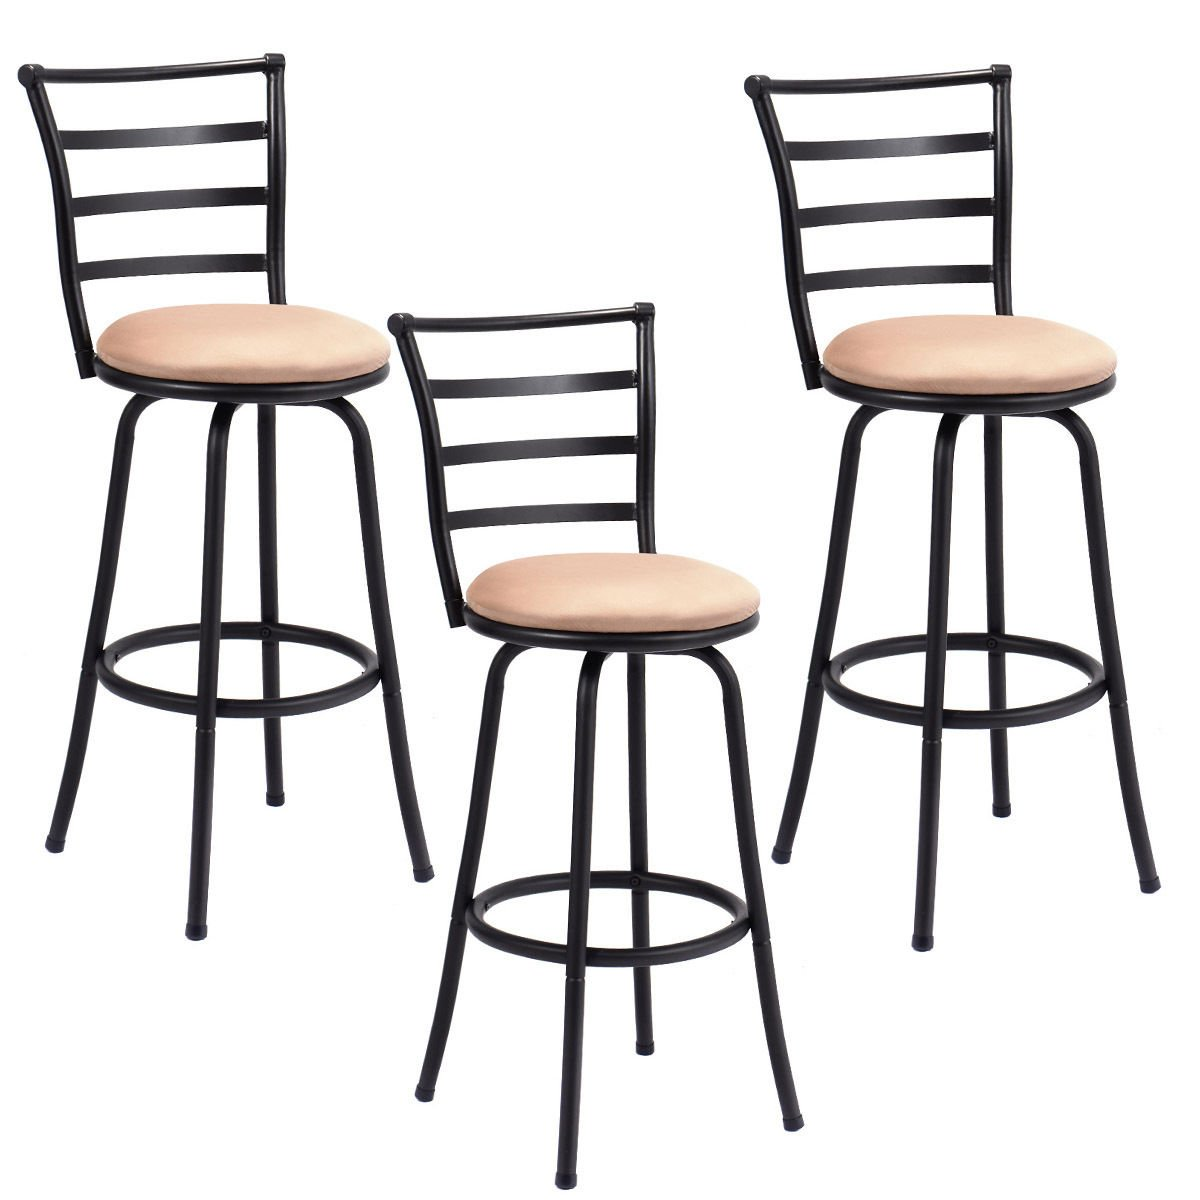 Costway Swivel Counter Height Bar Stool Steel Frame Modern Barstool Bistro Pub Chair (3Bar Stool)